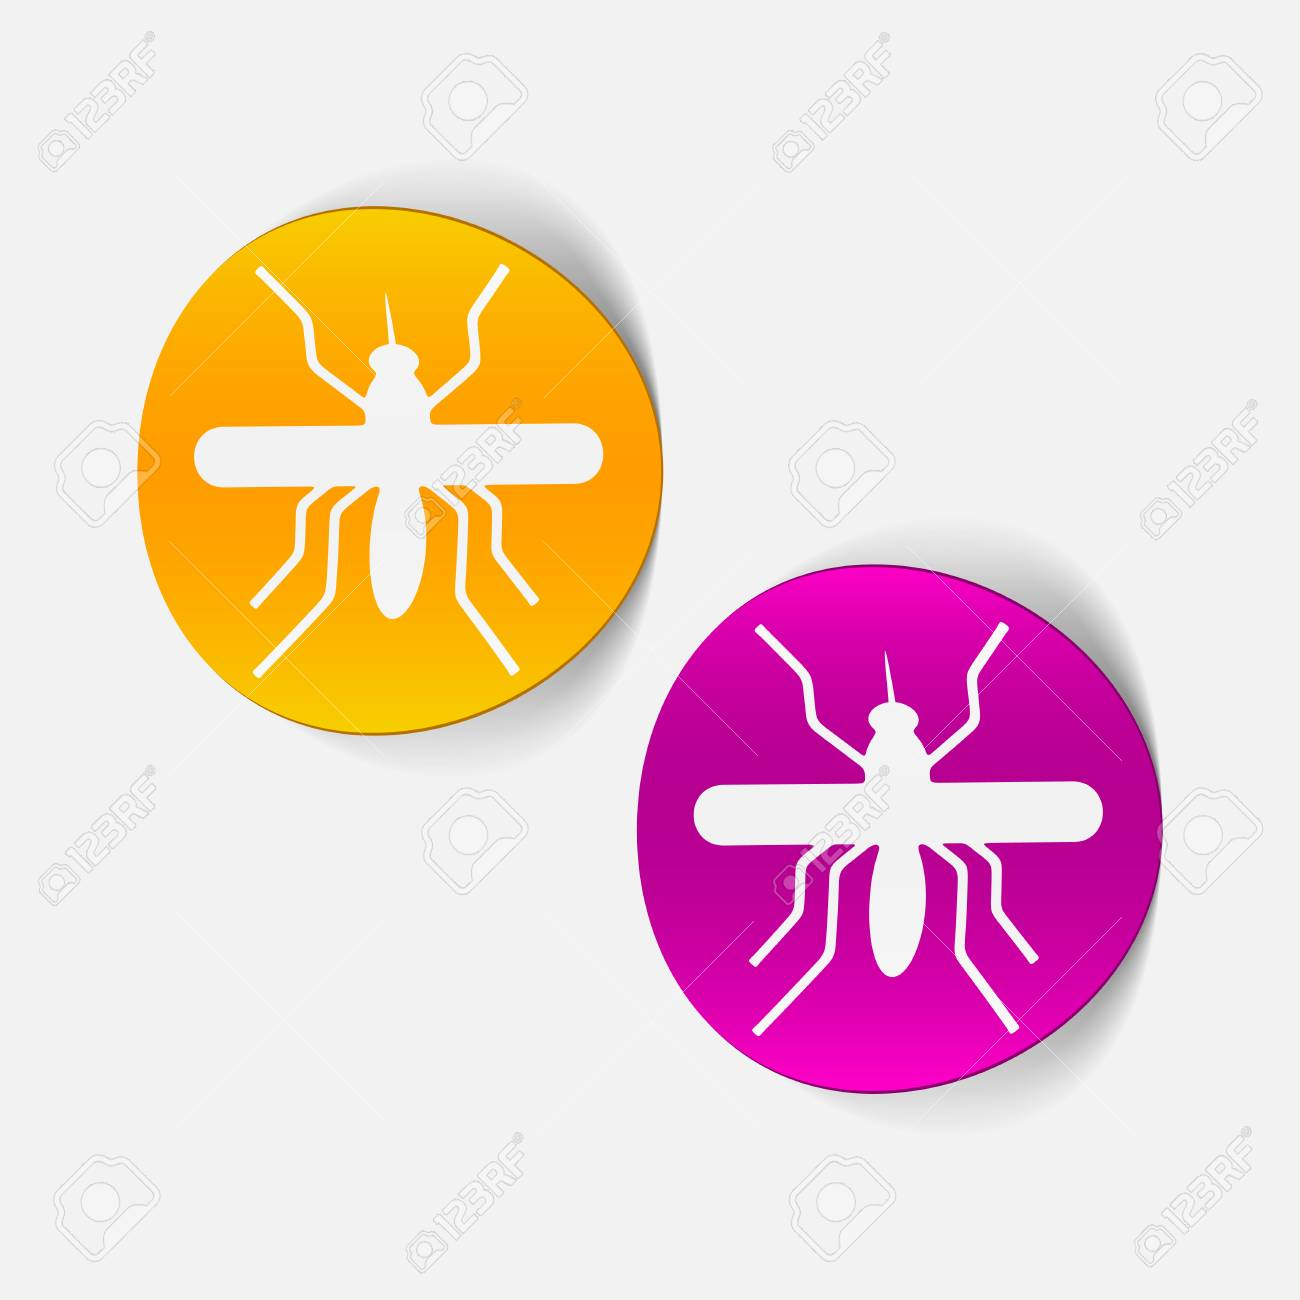 realistic design element: mosquito Stock Vector - 25414600